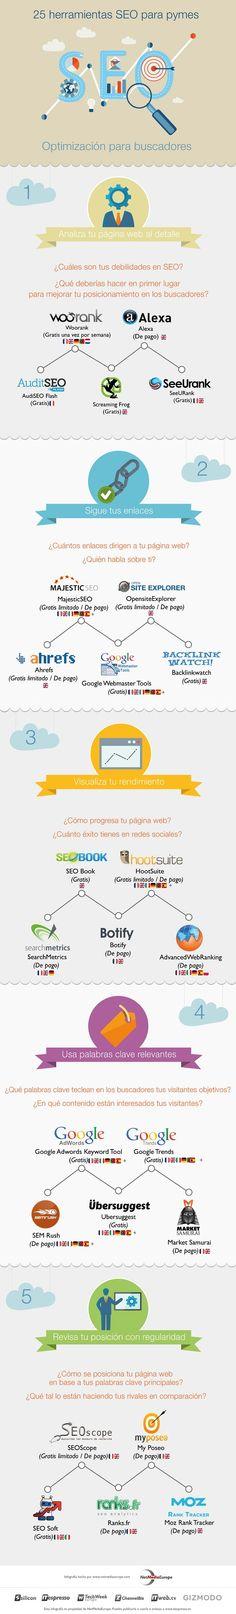 25 herramientas #SEO esenciales para tu pyme www.rubendelaosa.com @rubendelaosa